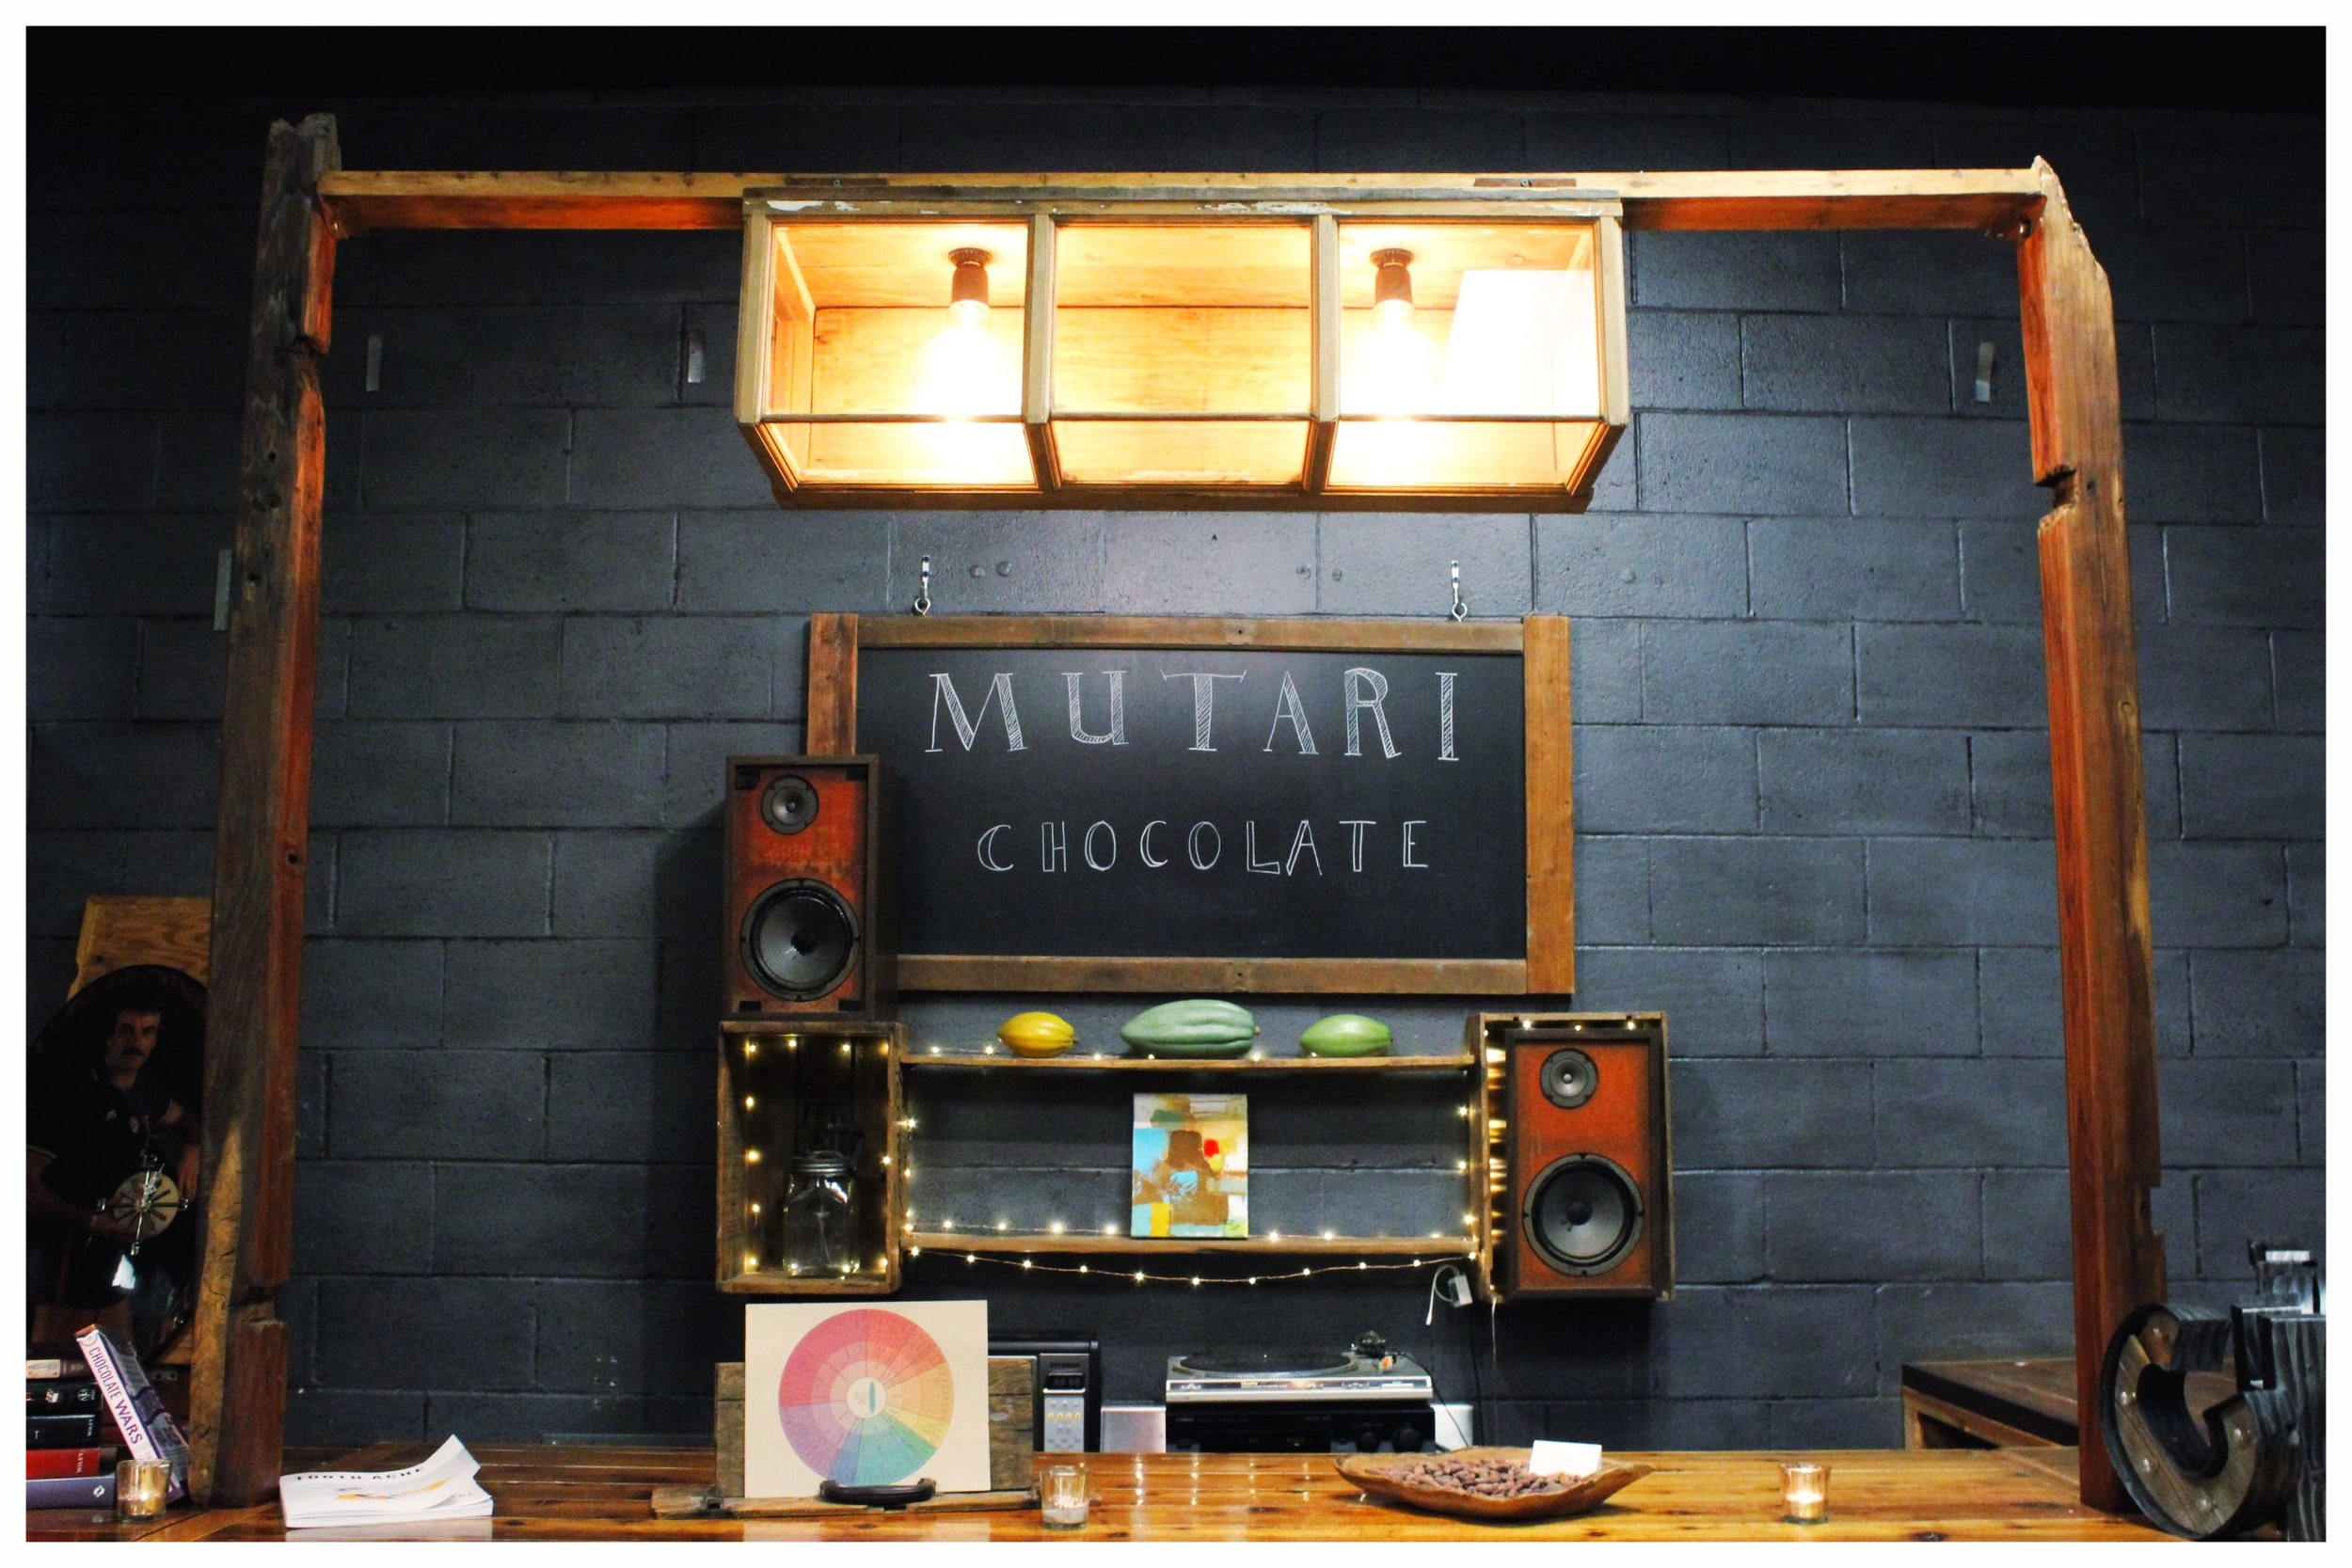 Mutari Chocolate Tasting Bar